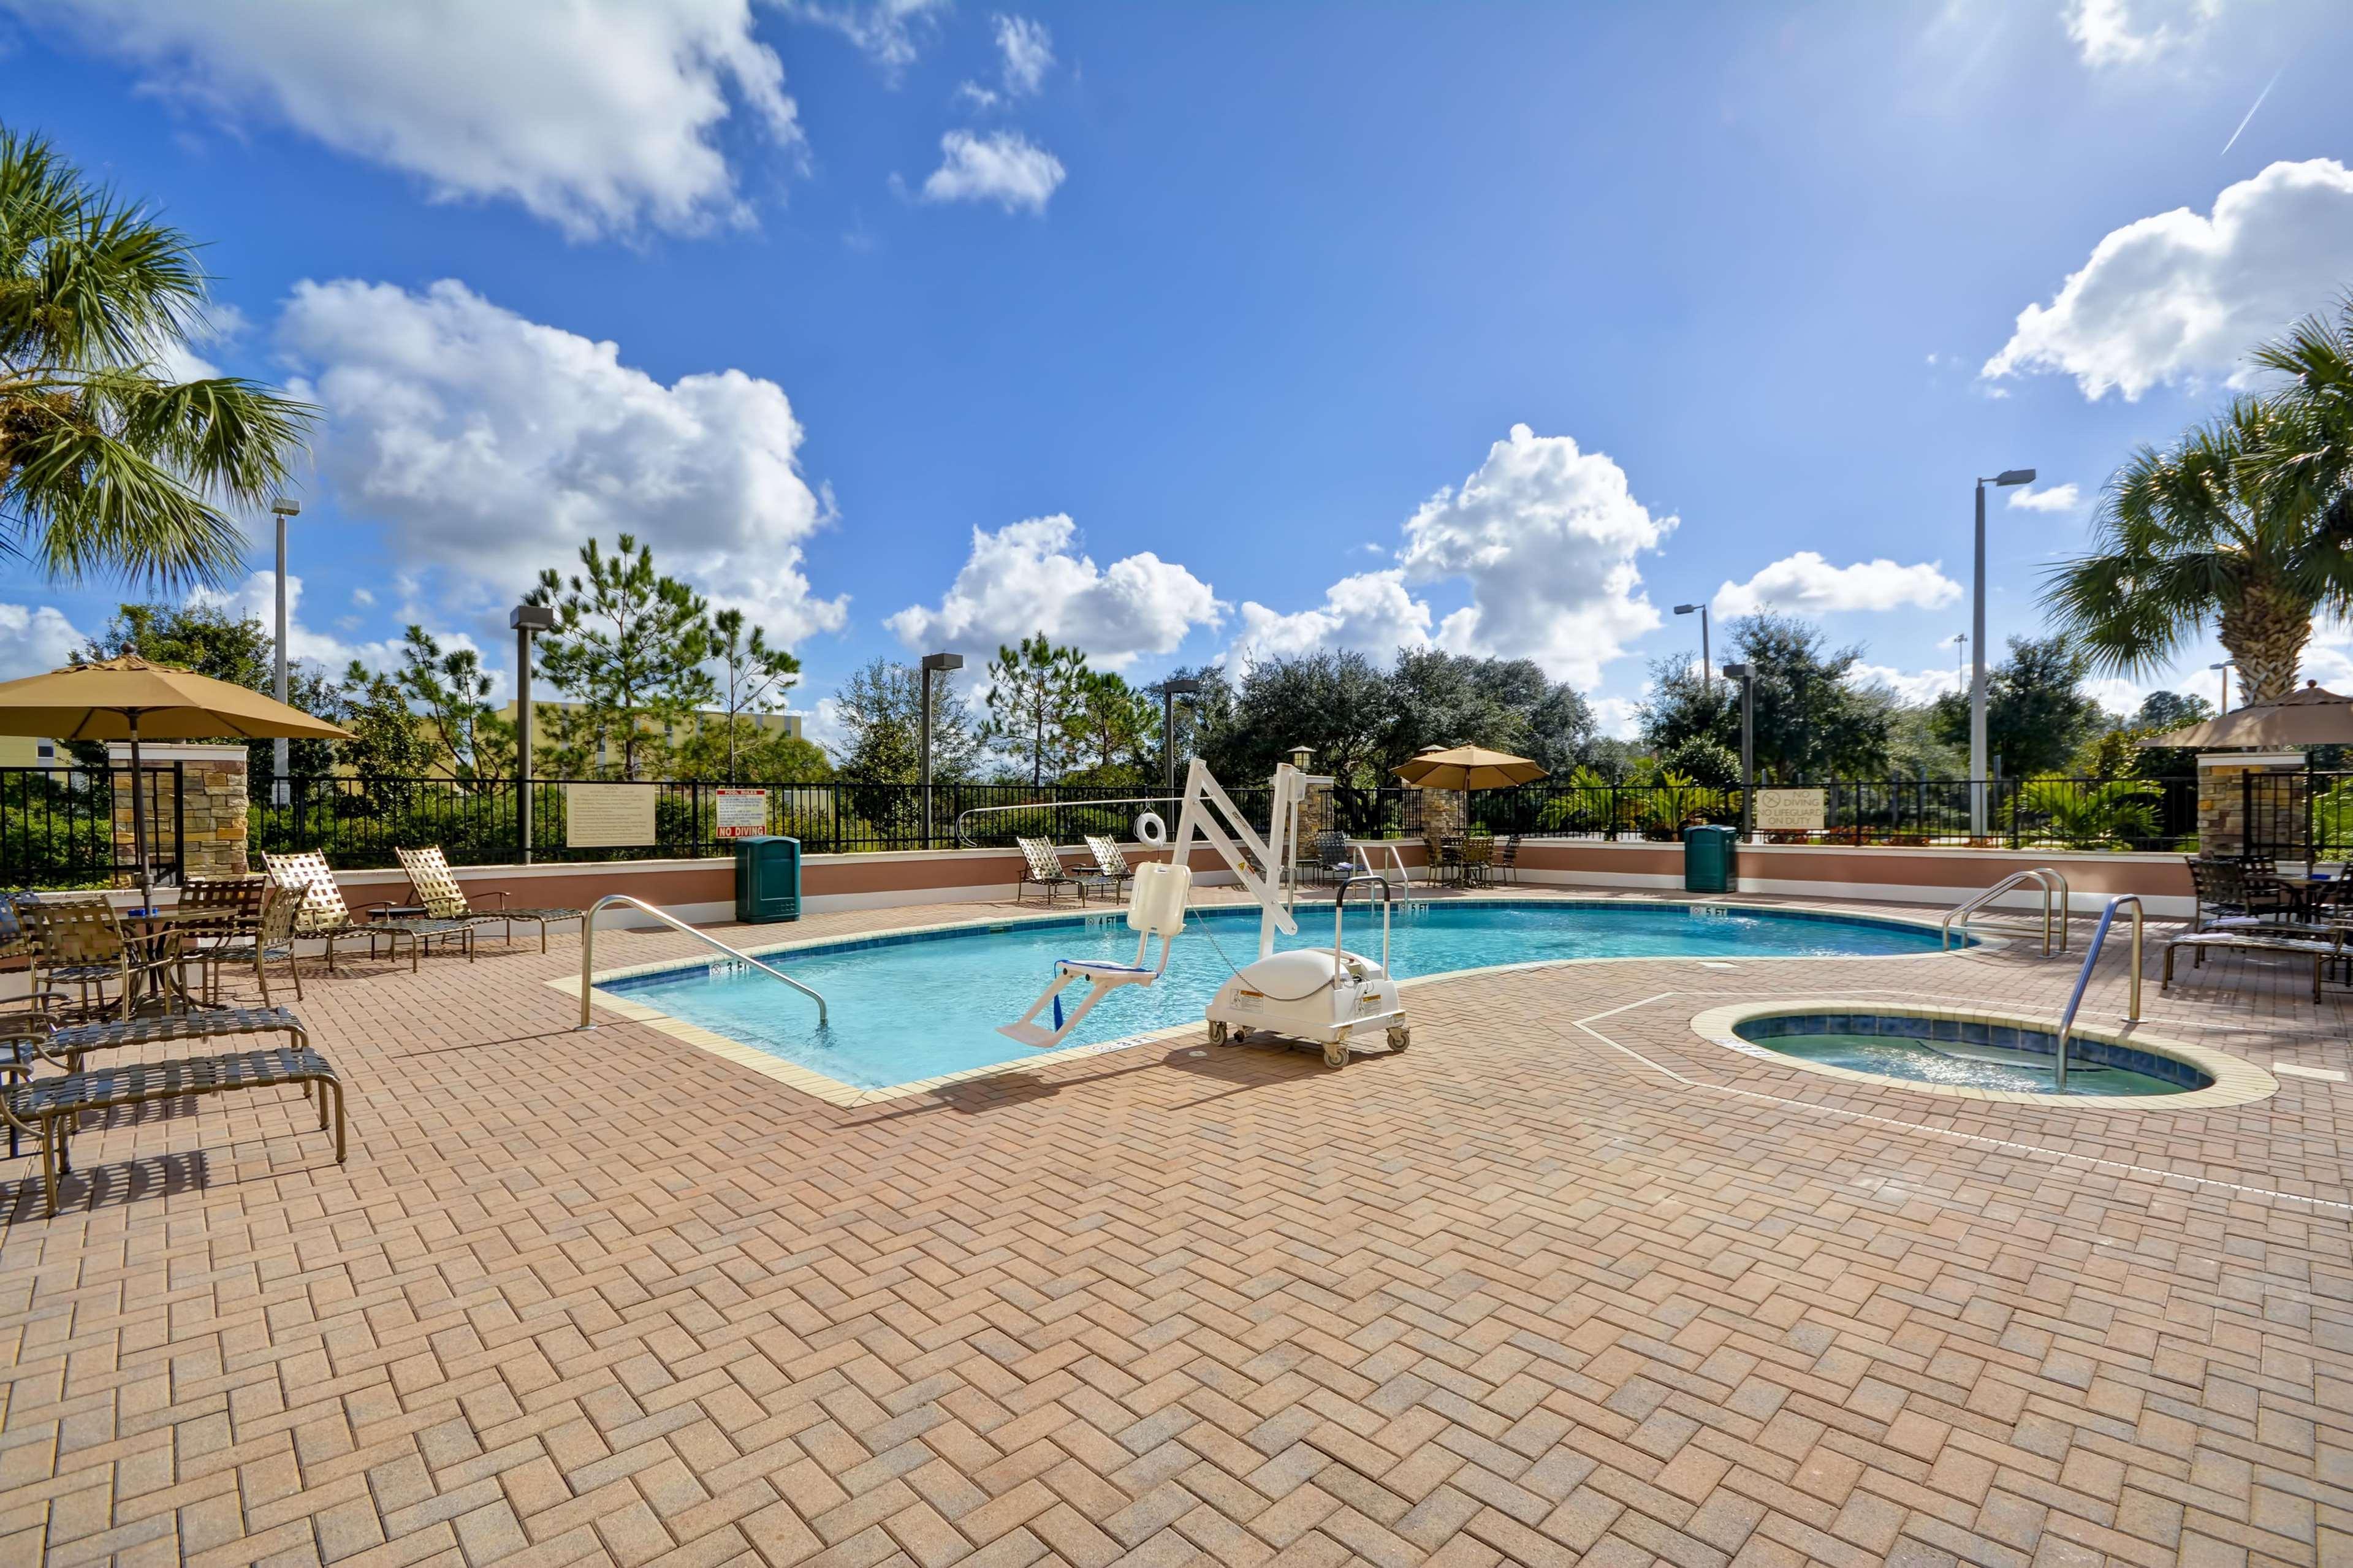 Hilton Garden Inn Tampa/Riverview/Brandon 4328 Garden Vista Dr, Riverview,  FL 33578   YP.com Awesome Design